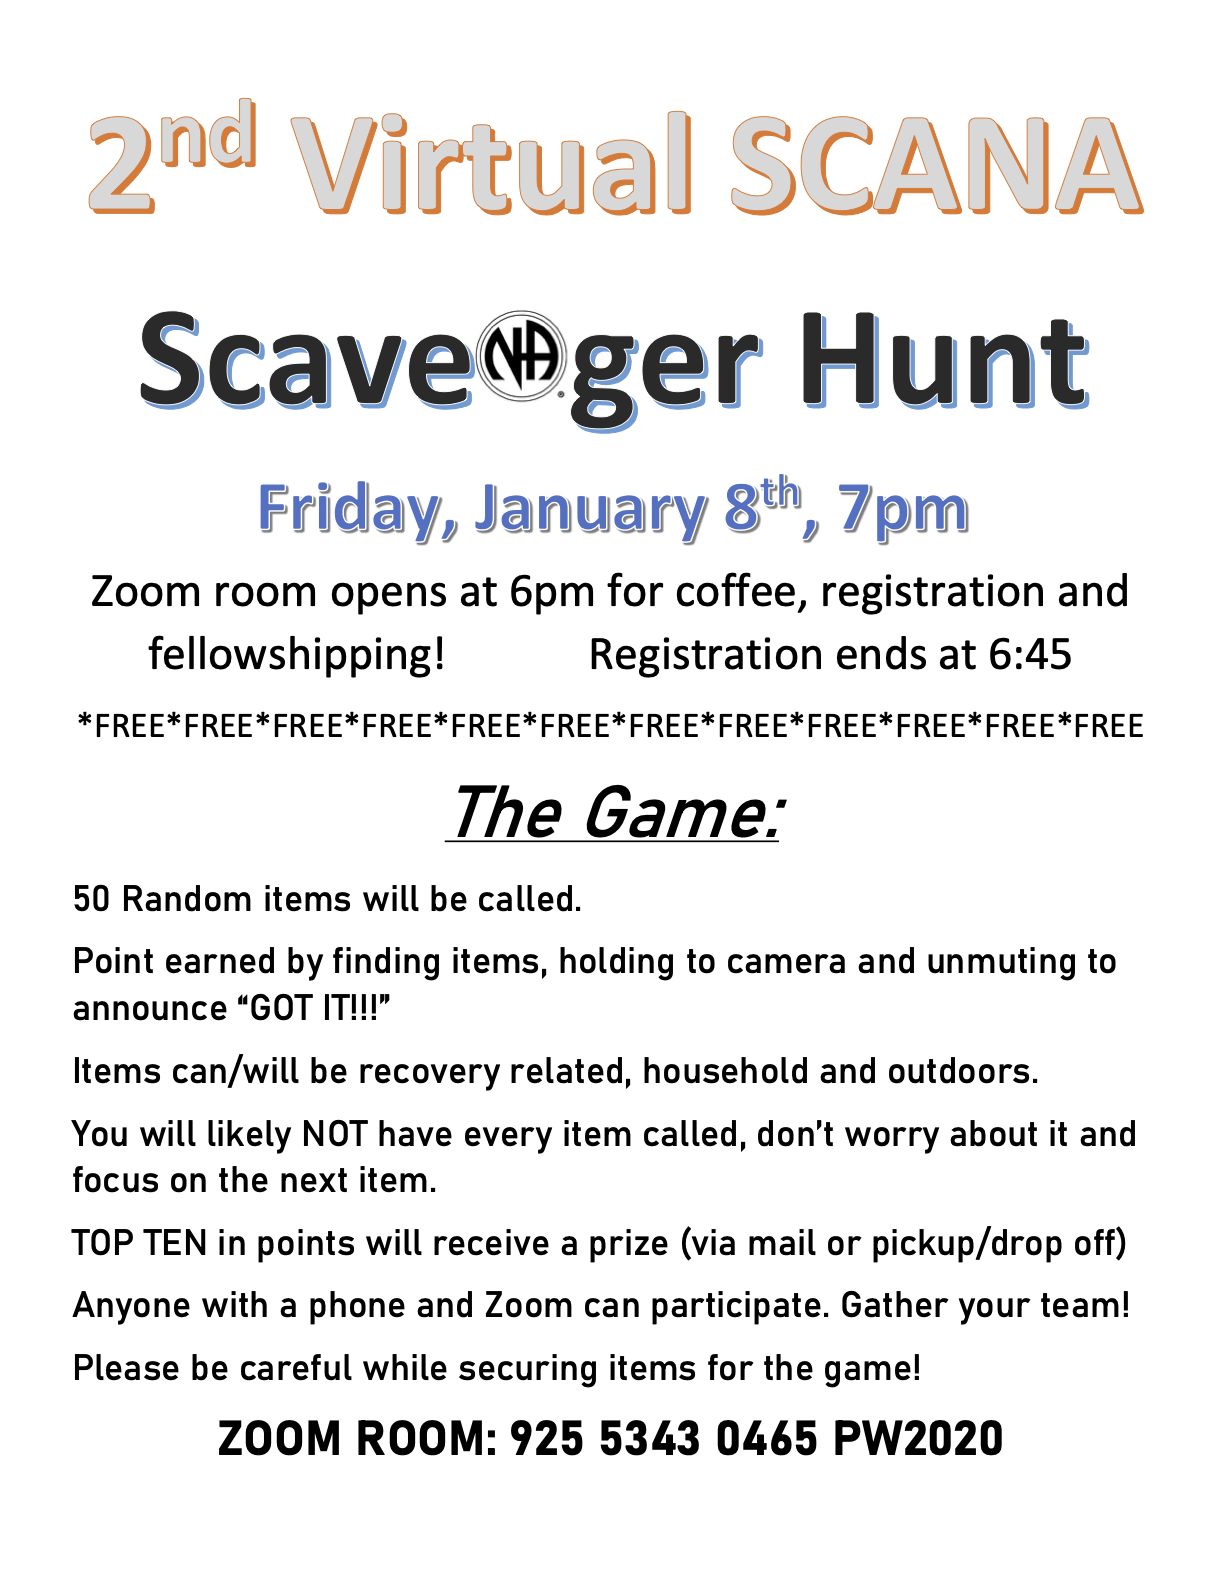 2nd Virtual Scavenger Hunt